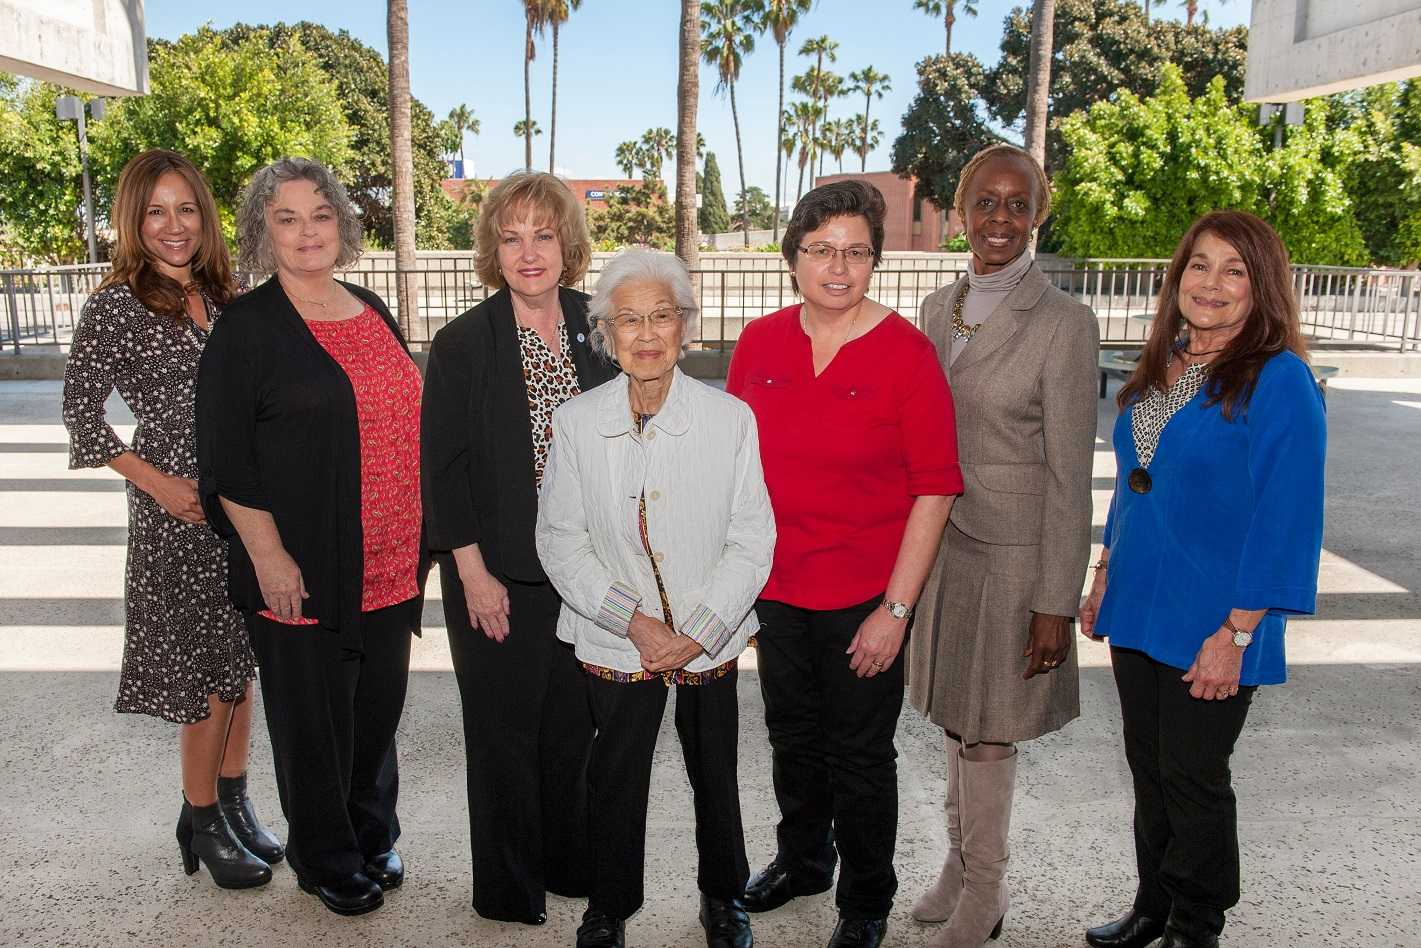 El Camino celebrates 20th annual Women's Wall of Fame